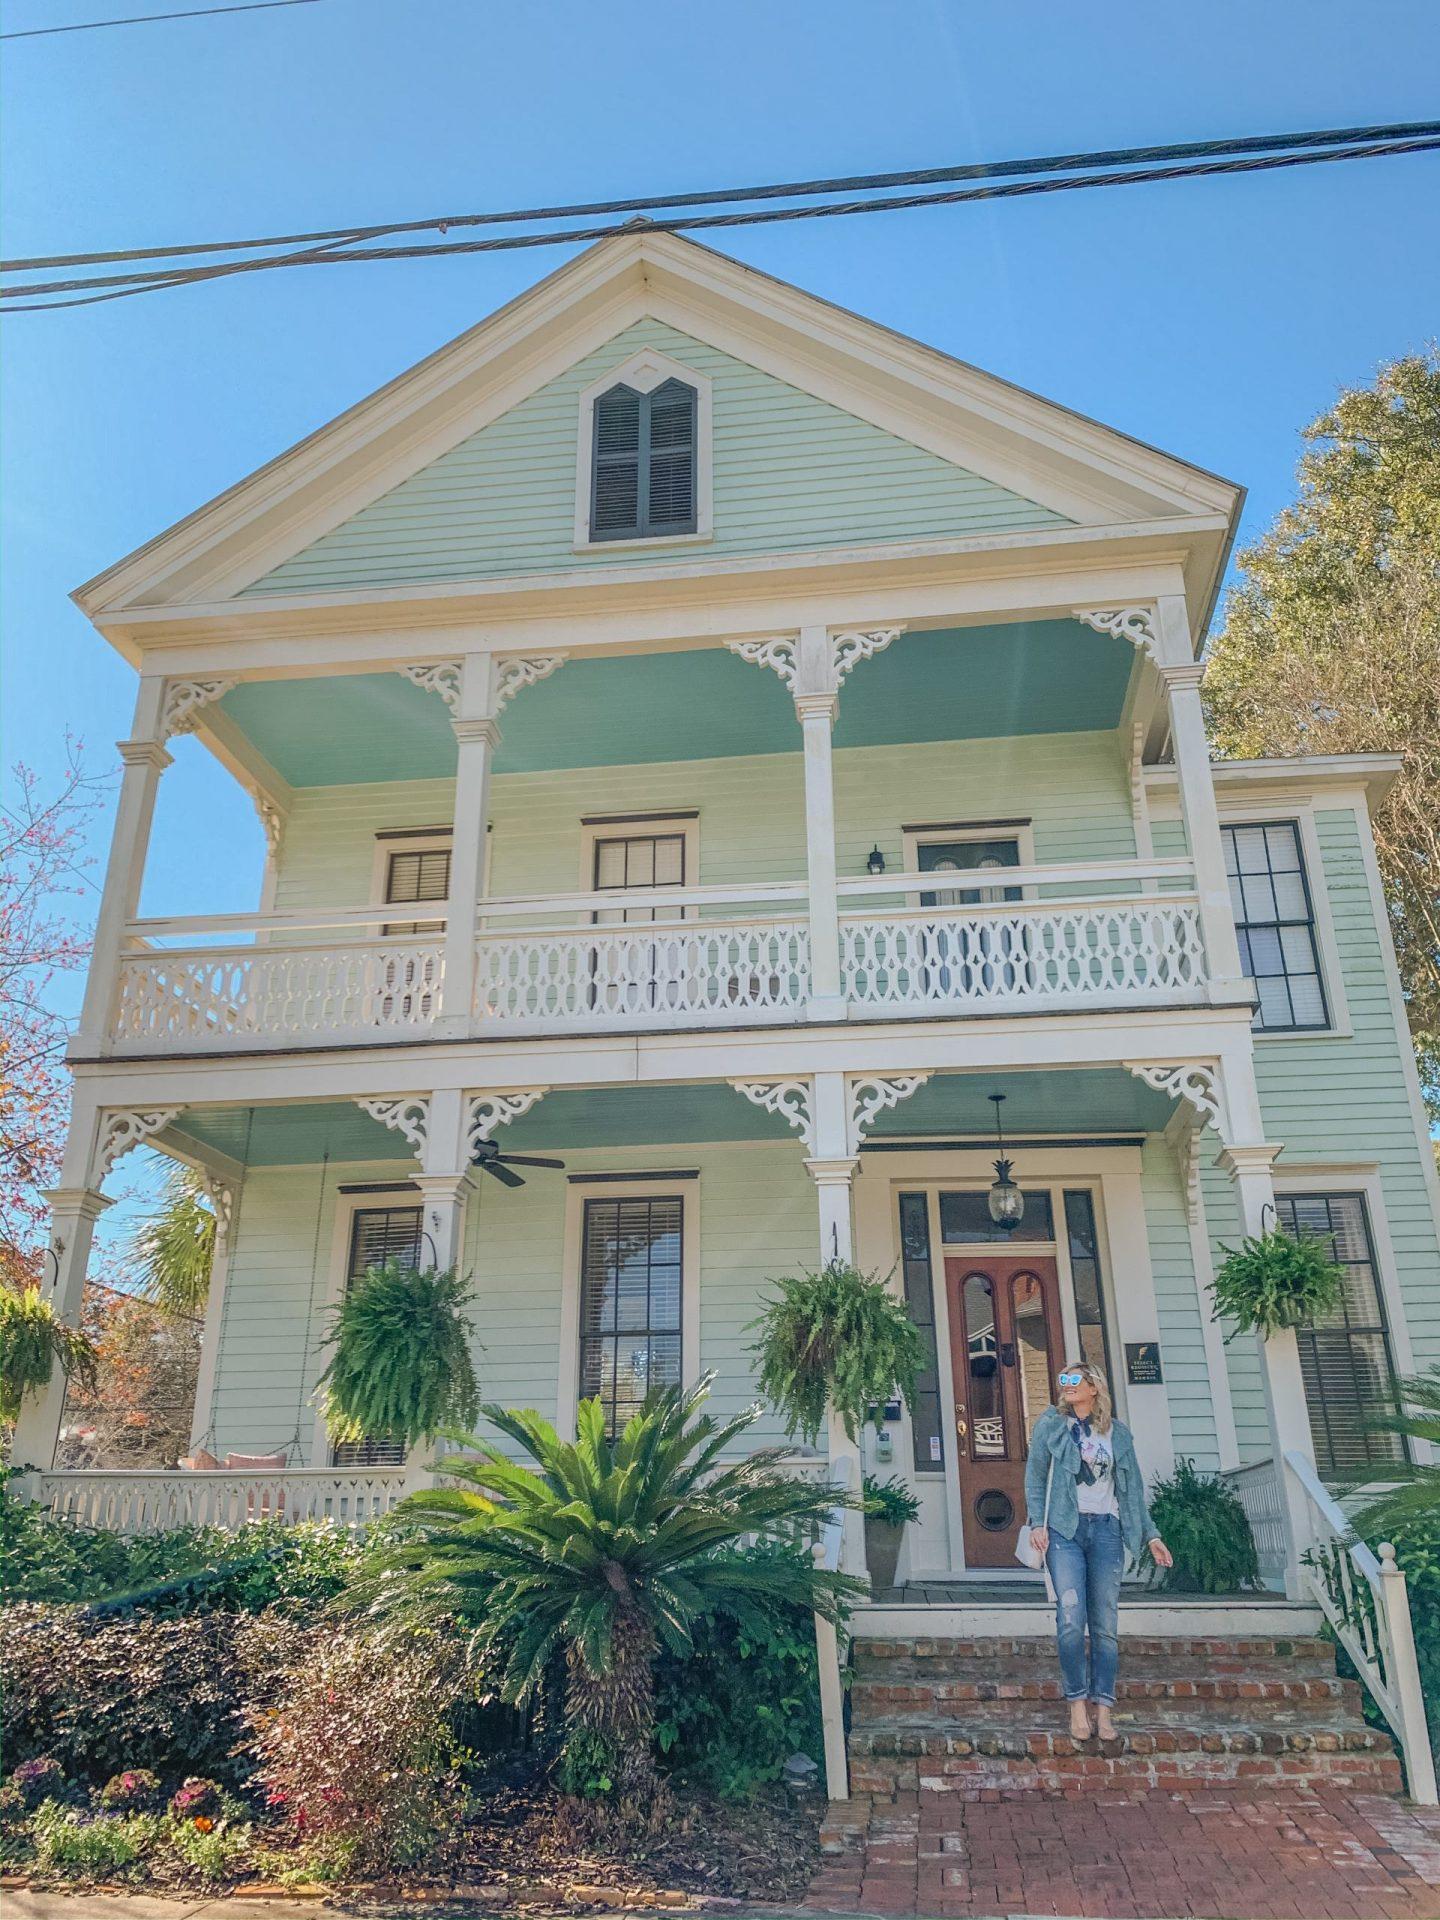 Bijuleni | Amelia Island Travel Guide - The Addison